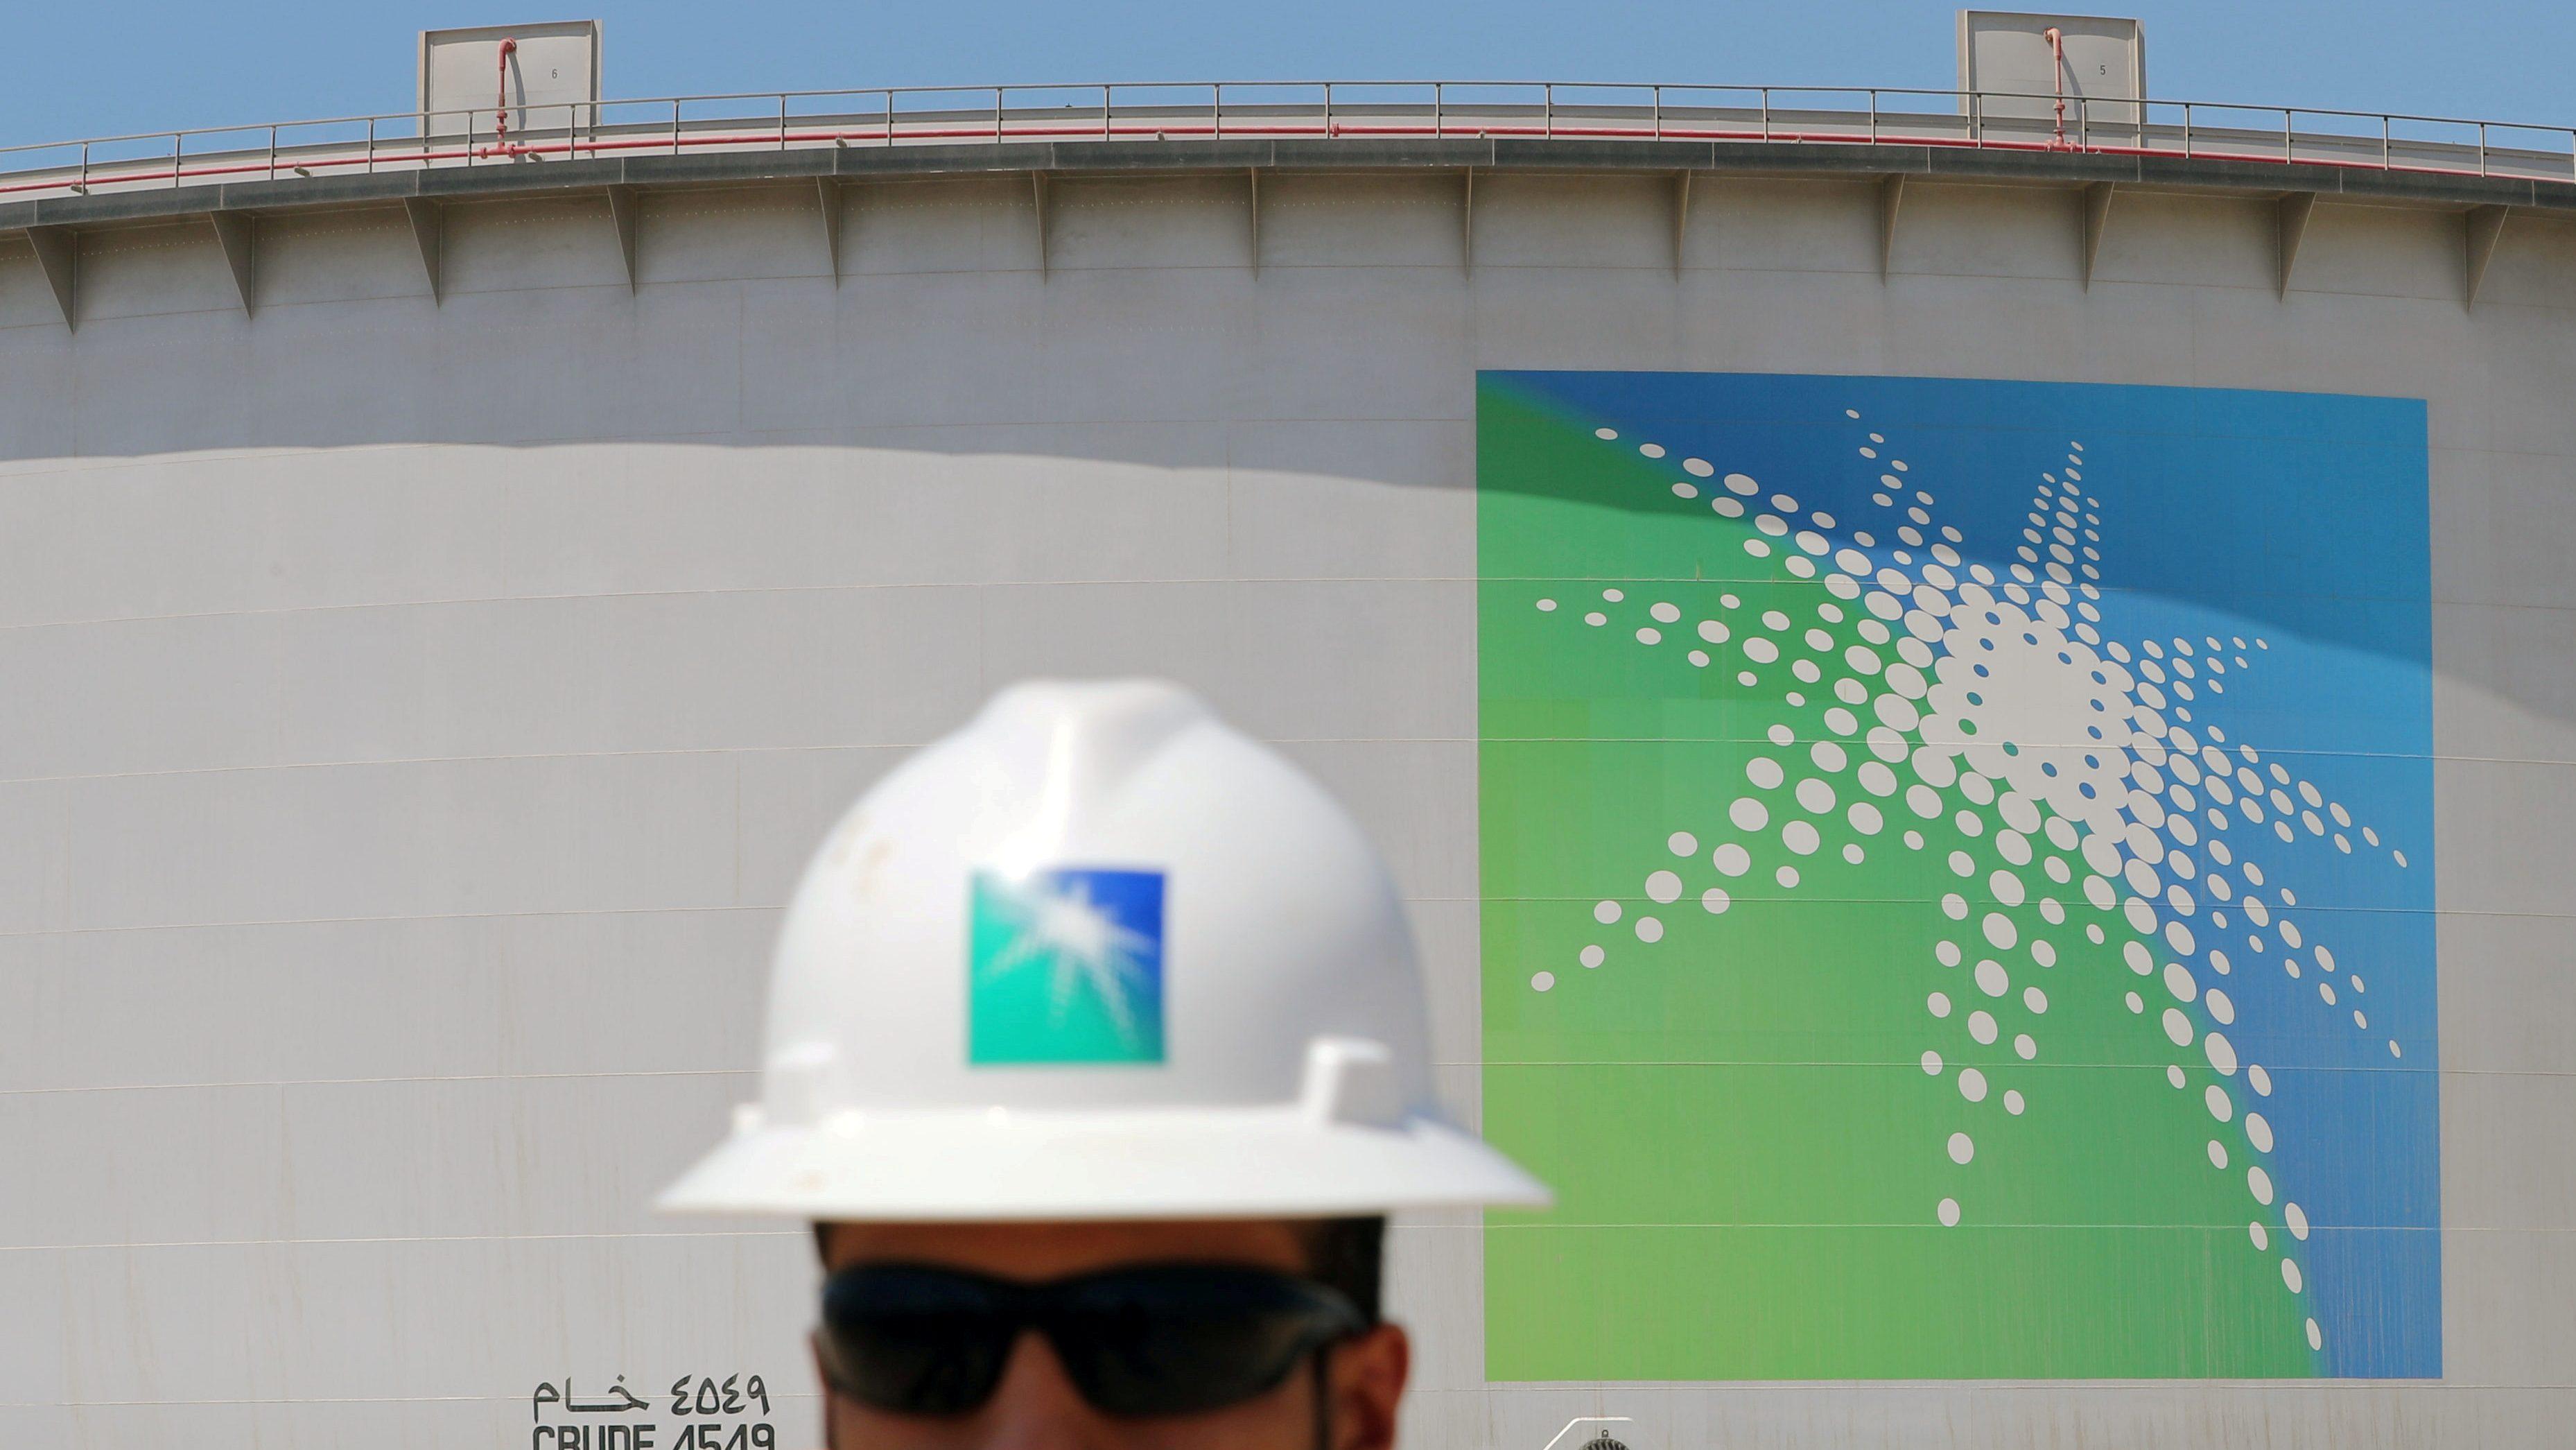 An Aramco employee walks near oil tank at Saudi Aramco's Ras Tanura oil refinery and oil terminal in Saudi Arabia May 21, 2018. Picture taken May 21, 2018.